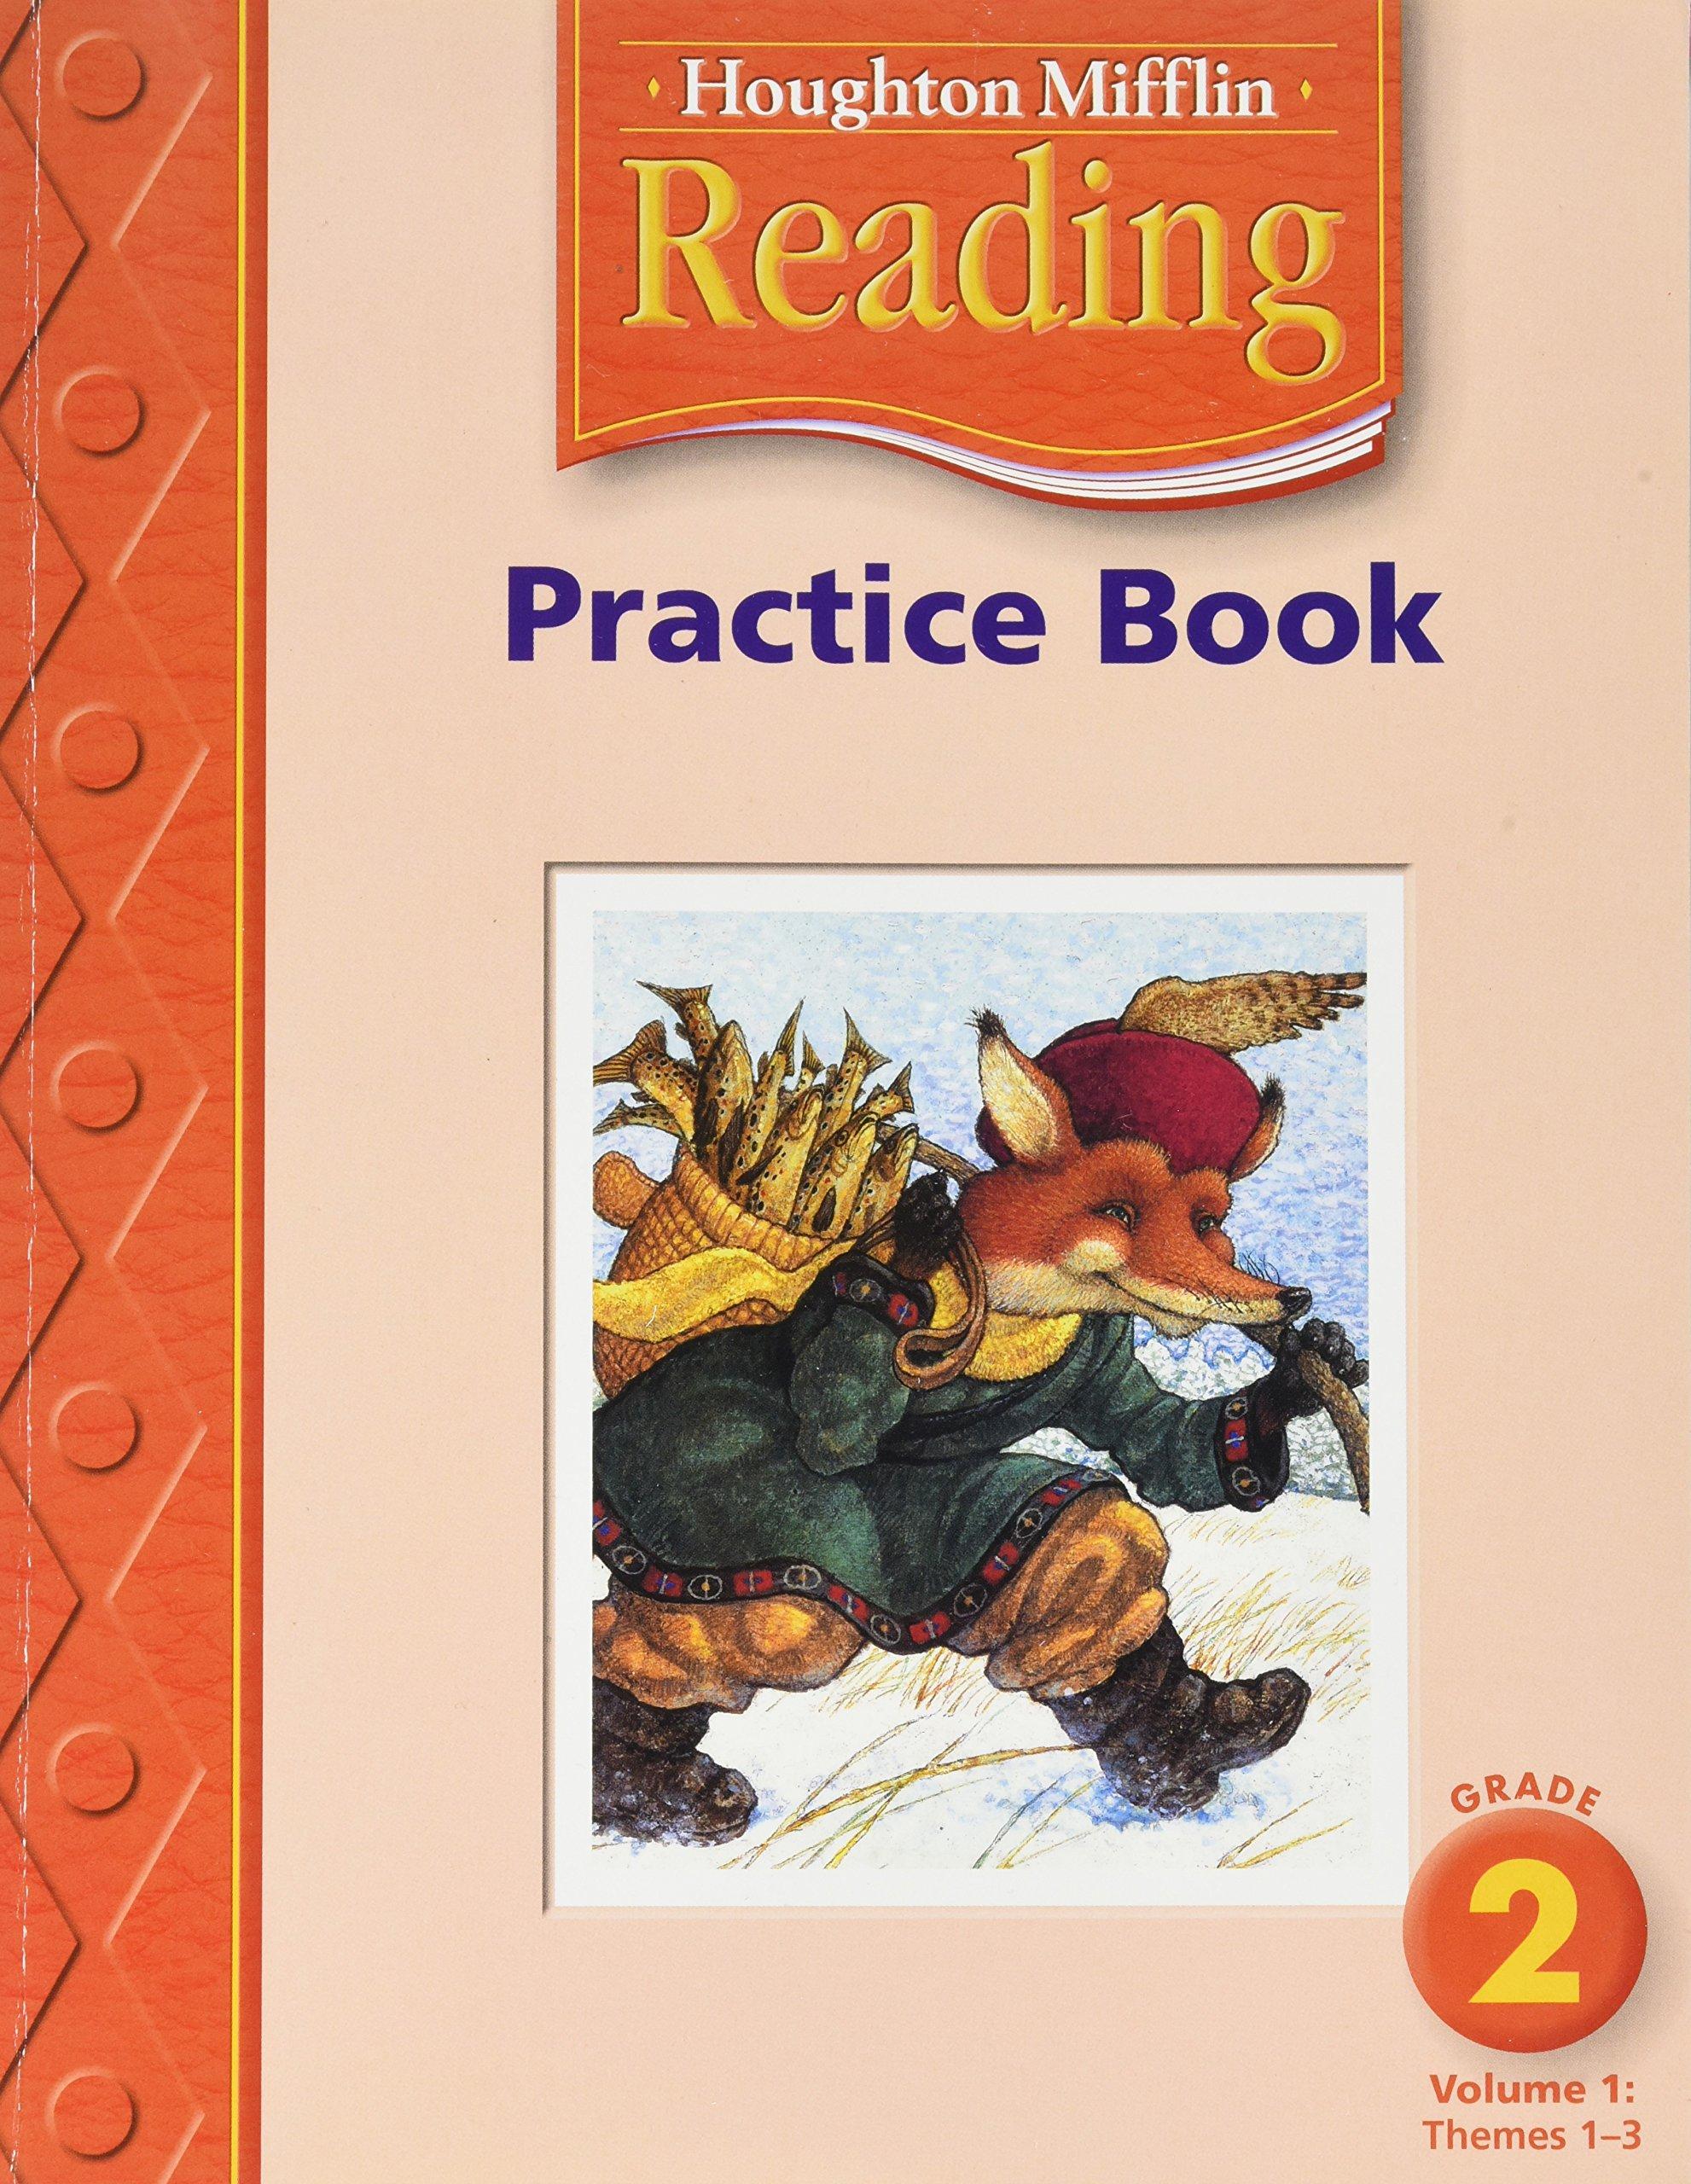 Houghton Mifflin Reading: Practice Book, Level 2, Vol. 1 ...